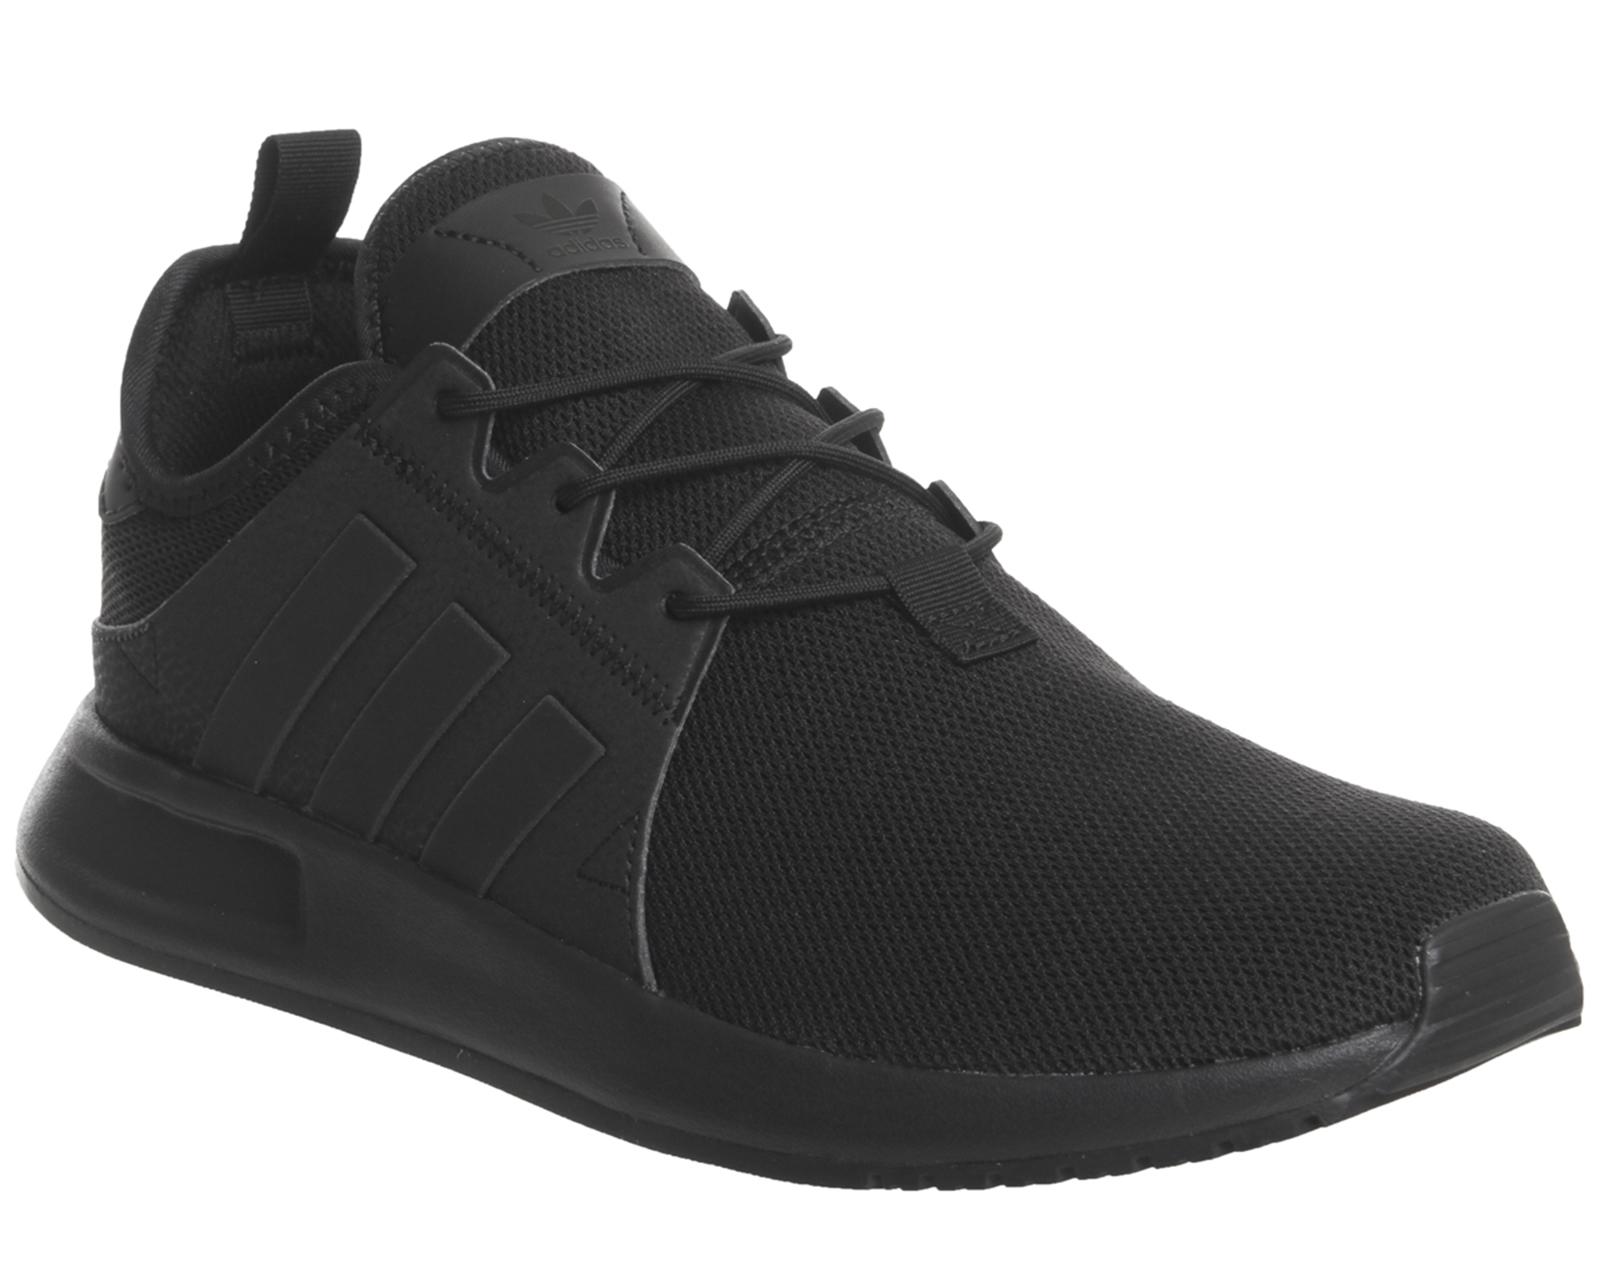 low cost 9fcd7 4b99d Sentinel Adidas X Plr Black Mono Trainers Shoes